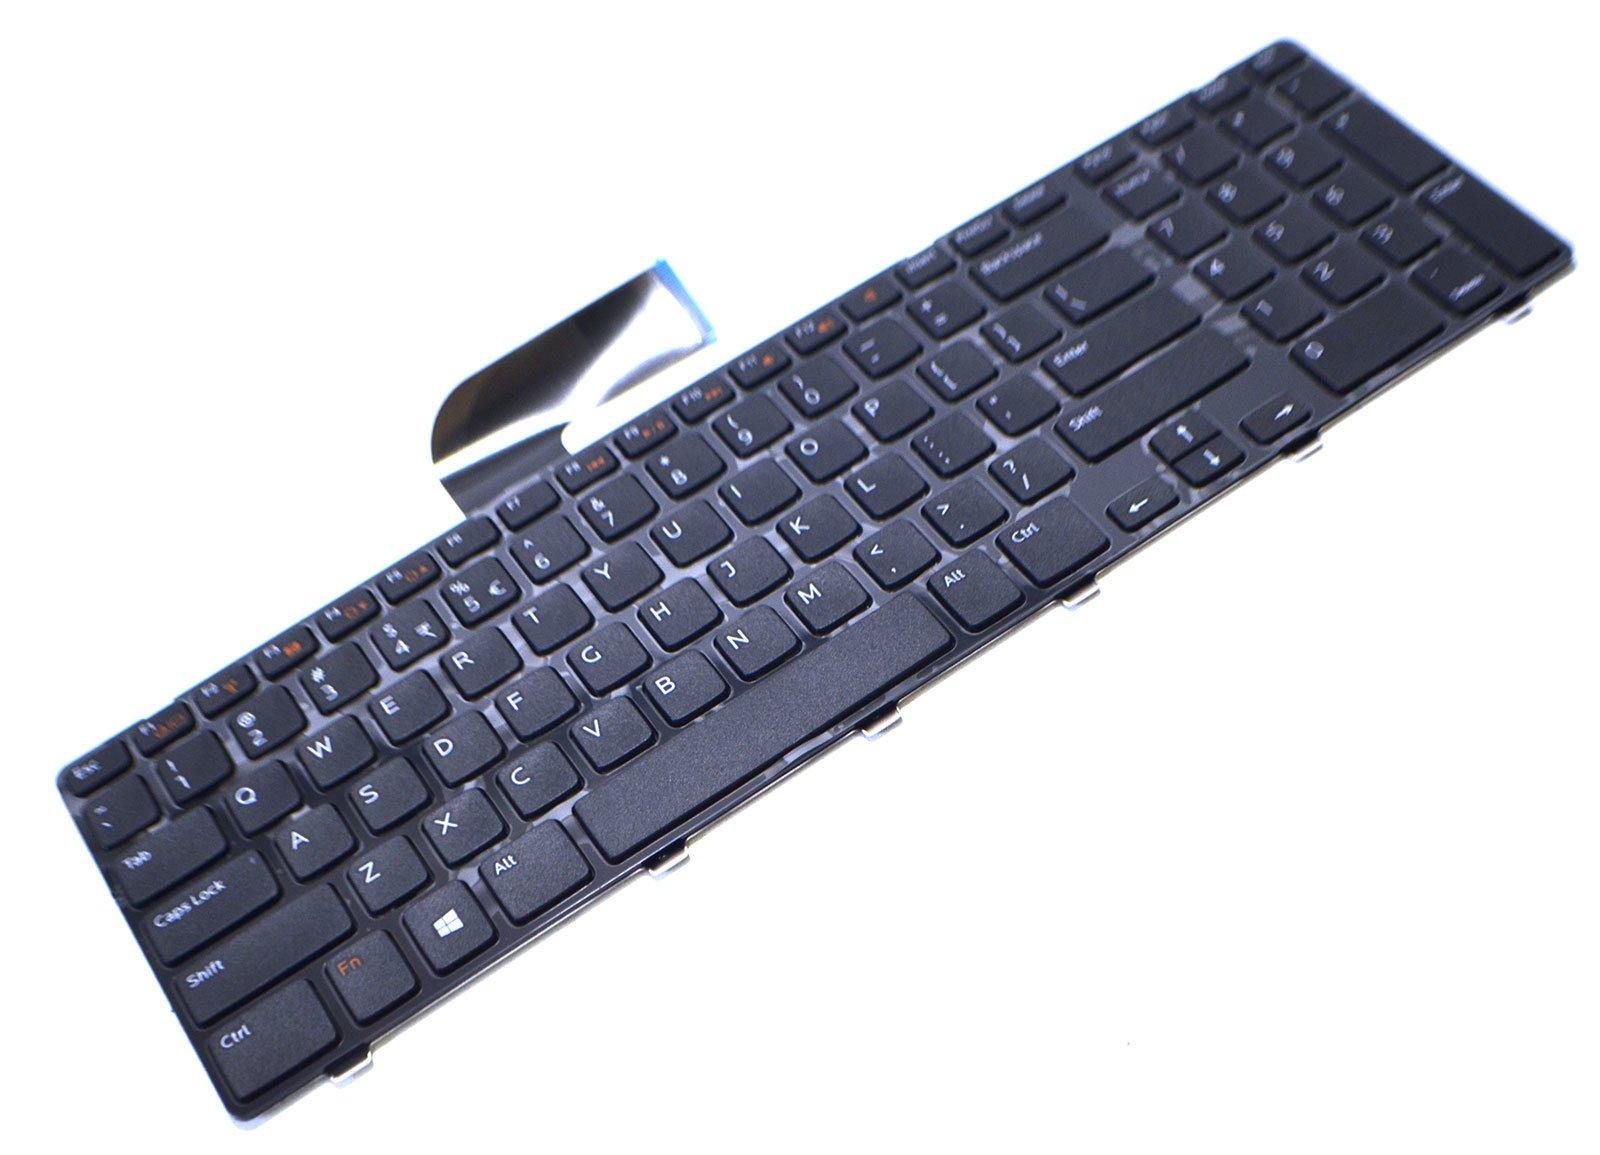 Dell M22MF New Genuine OEM XPS 17 L702X Vostro 3750 Inspiron 17R 5720 7720 N7110 Laptop Notebook US English 102 Key Keypad Input Typing DARFON Model NSK-DZ2SQ 1D Keyboard AER09R00010